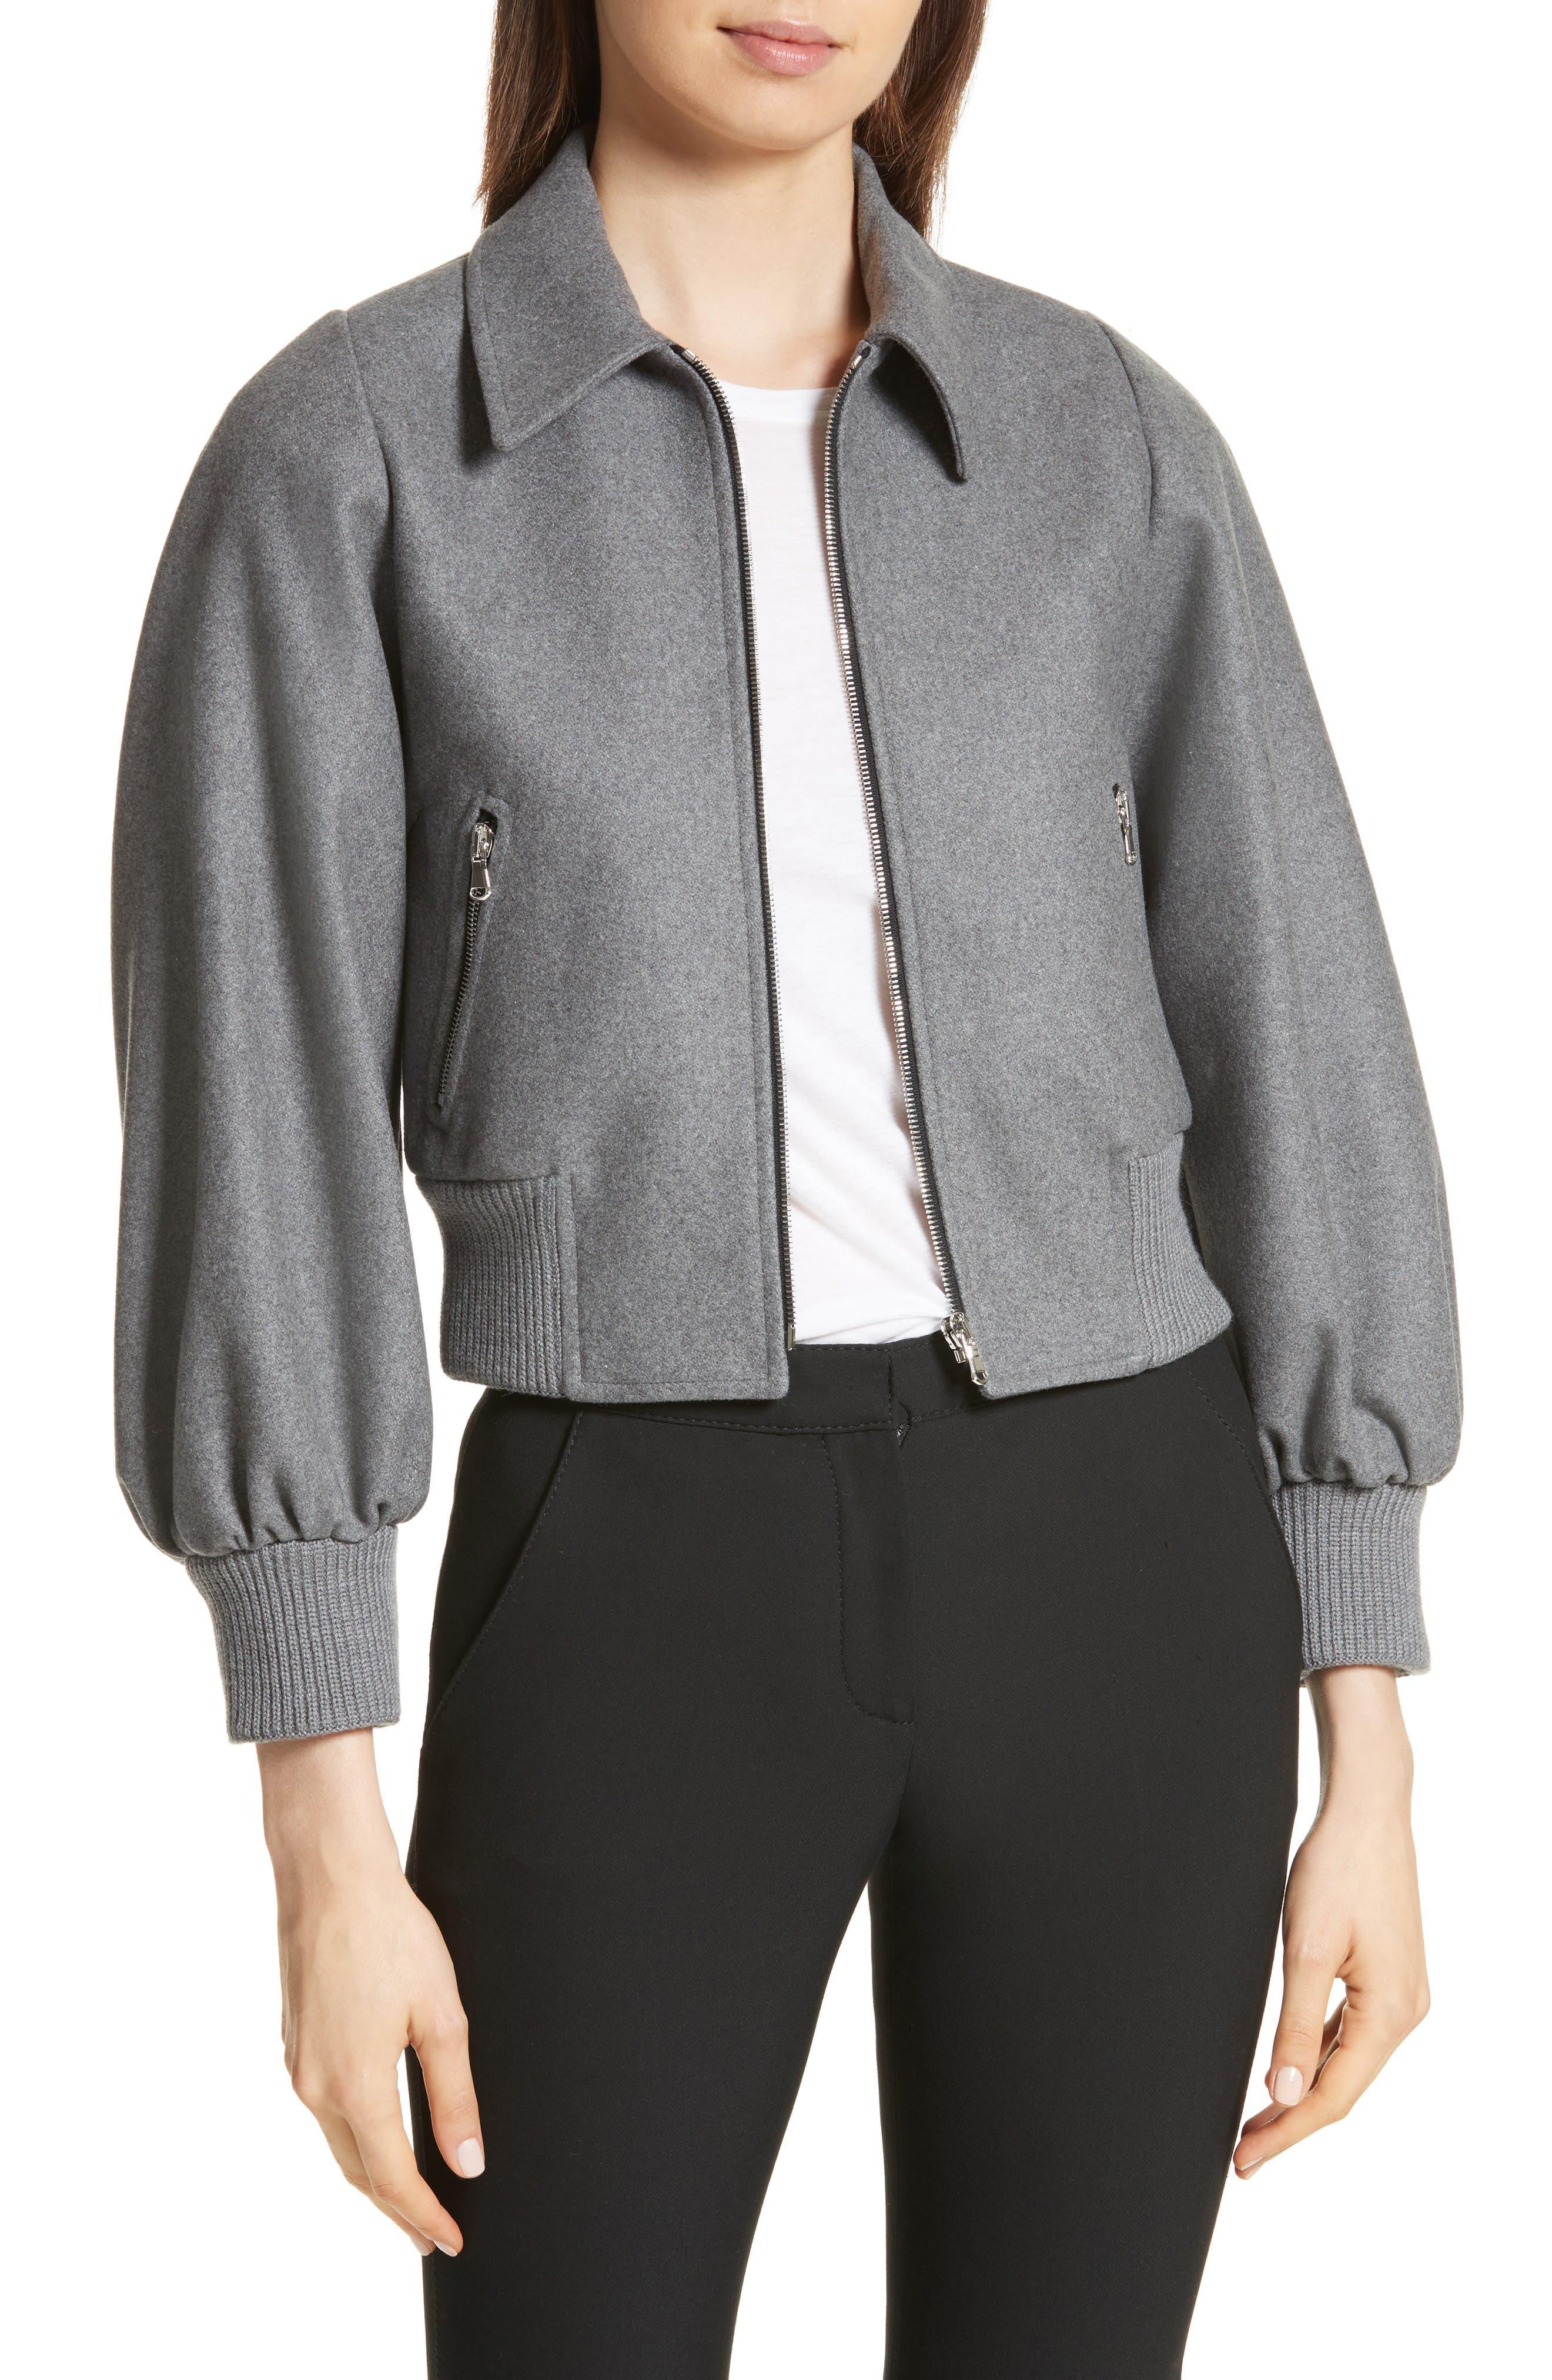 Alternate Image 1 Selected - RED Valentino Mélange Wool Blend Jacket